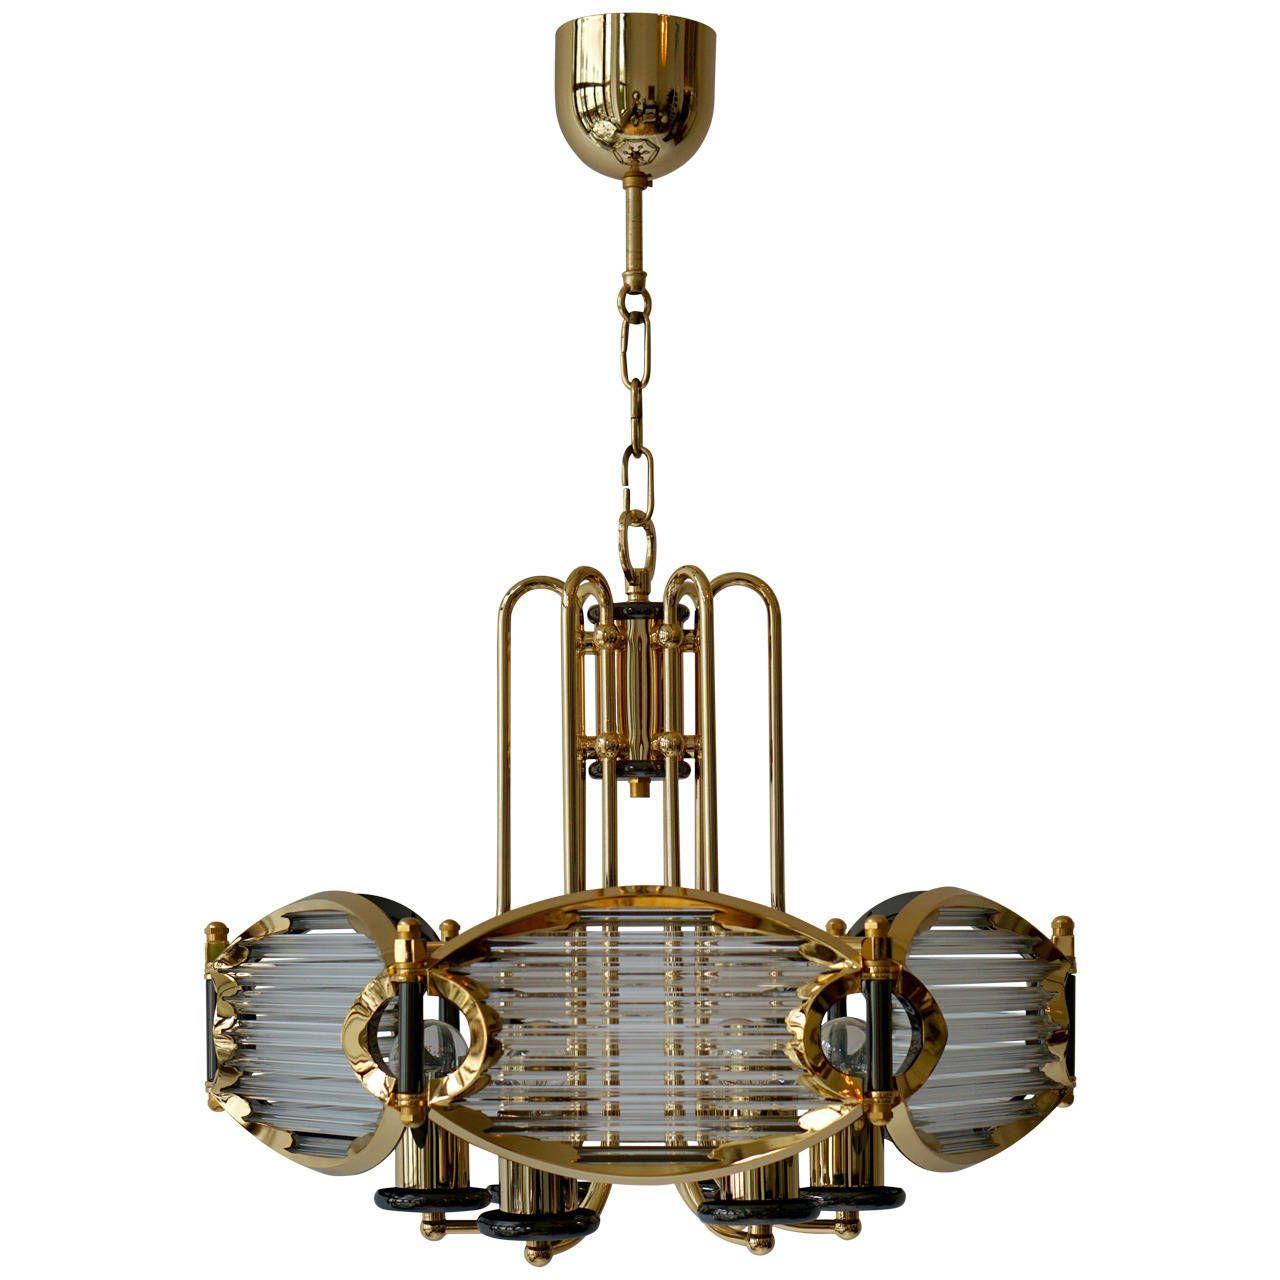 Bakalowits goldplated crystal chandelier pendant lighting